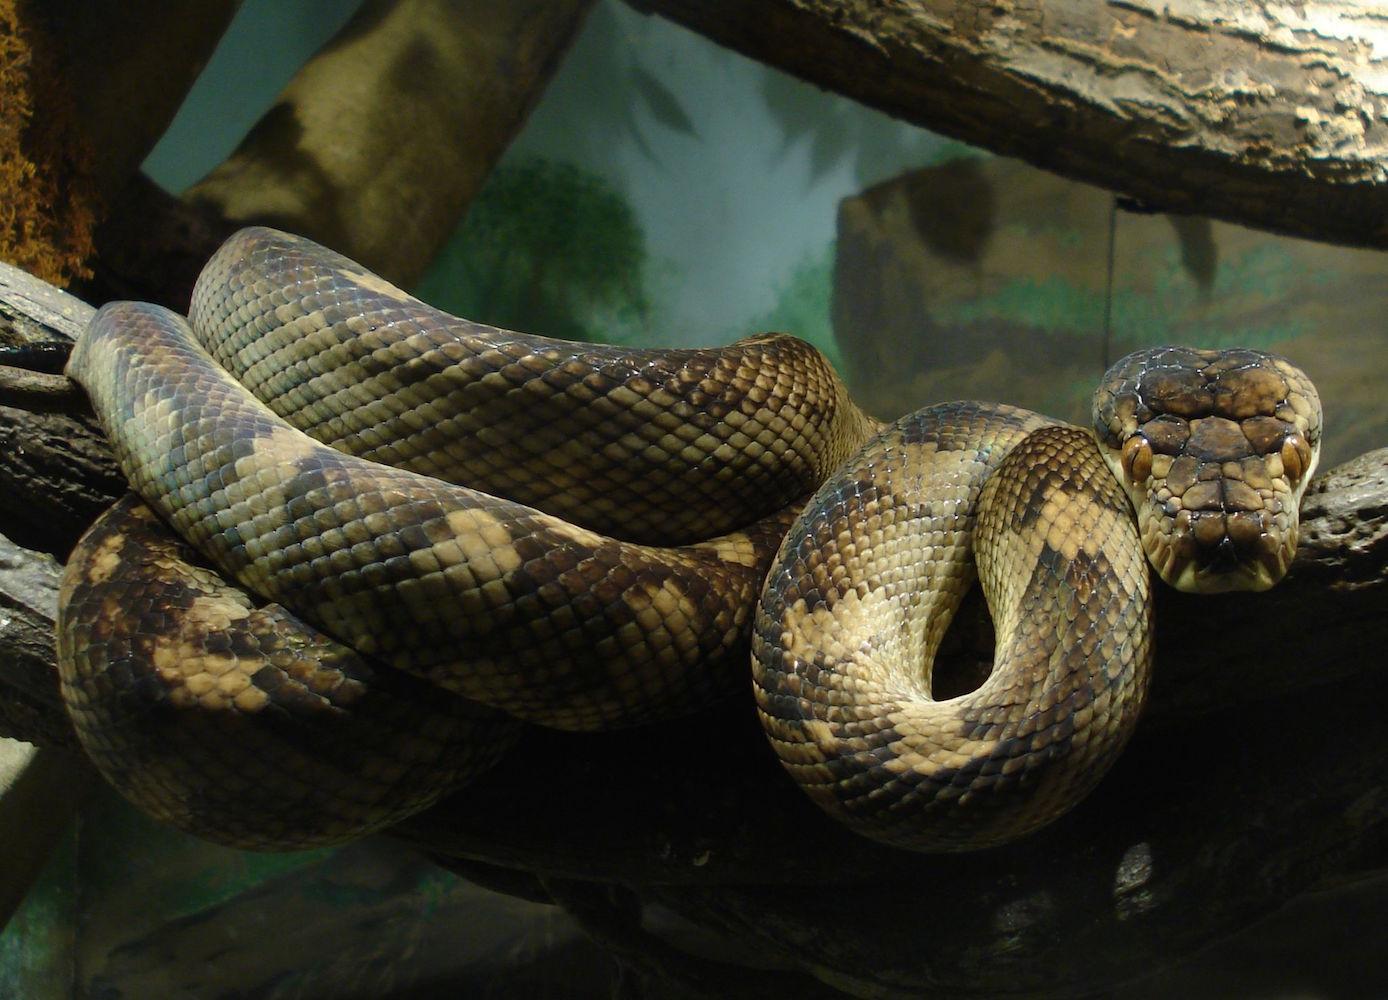 Morelia amethystina Bronx zoo, New York City. Photo © One Dead President / Wikimedia Commons